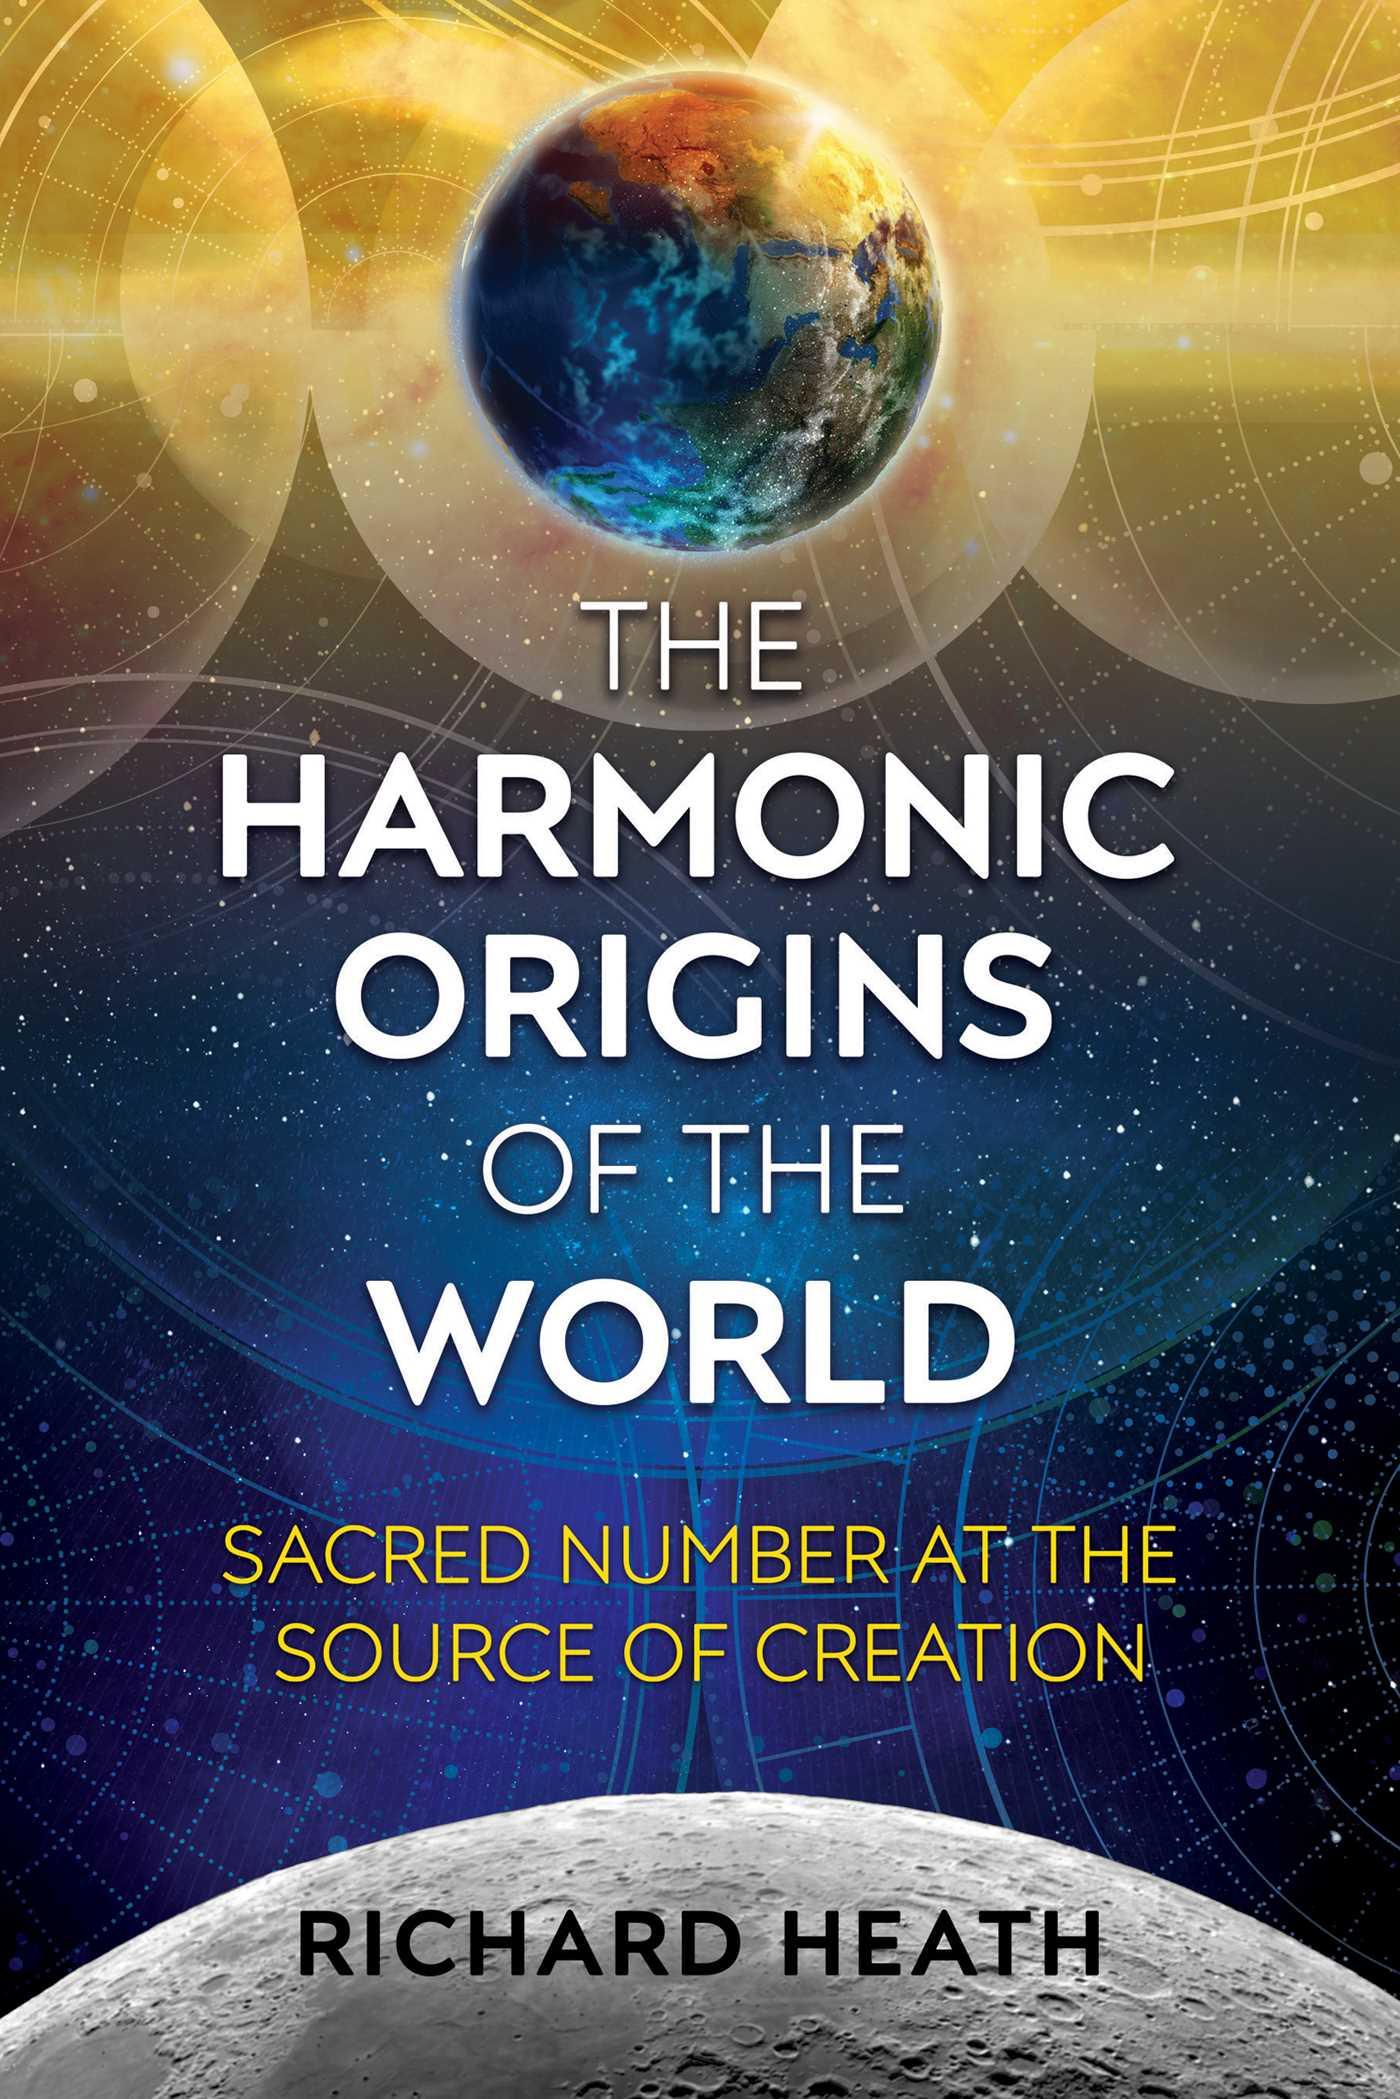 The harmonic origins of the world 9781620556139 hr